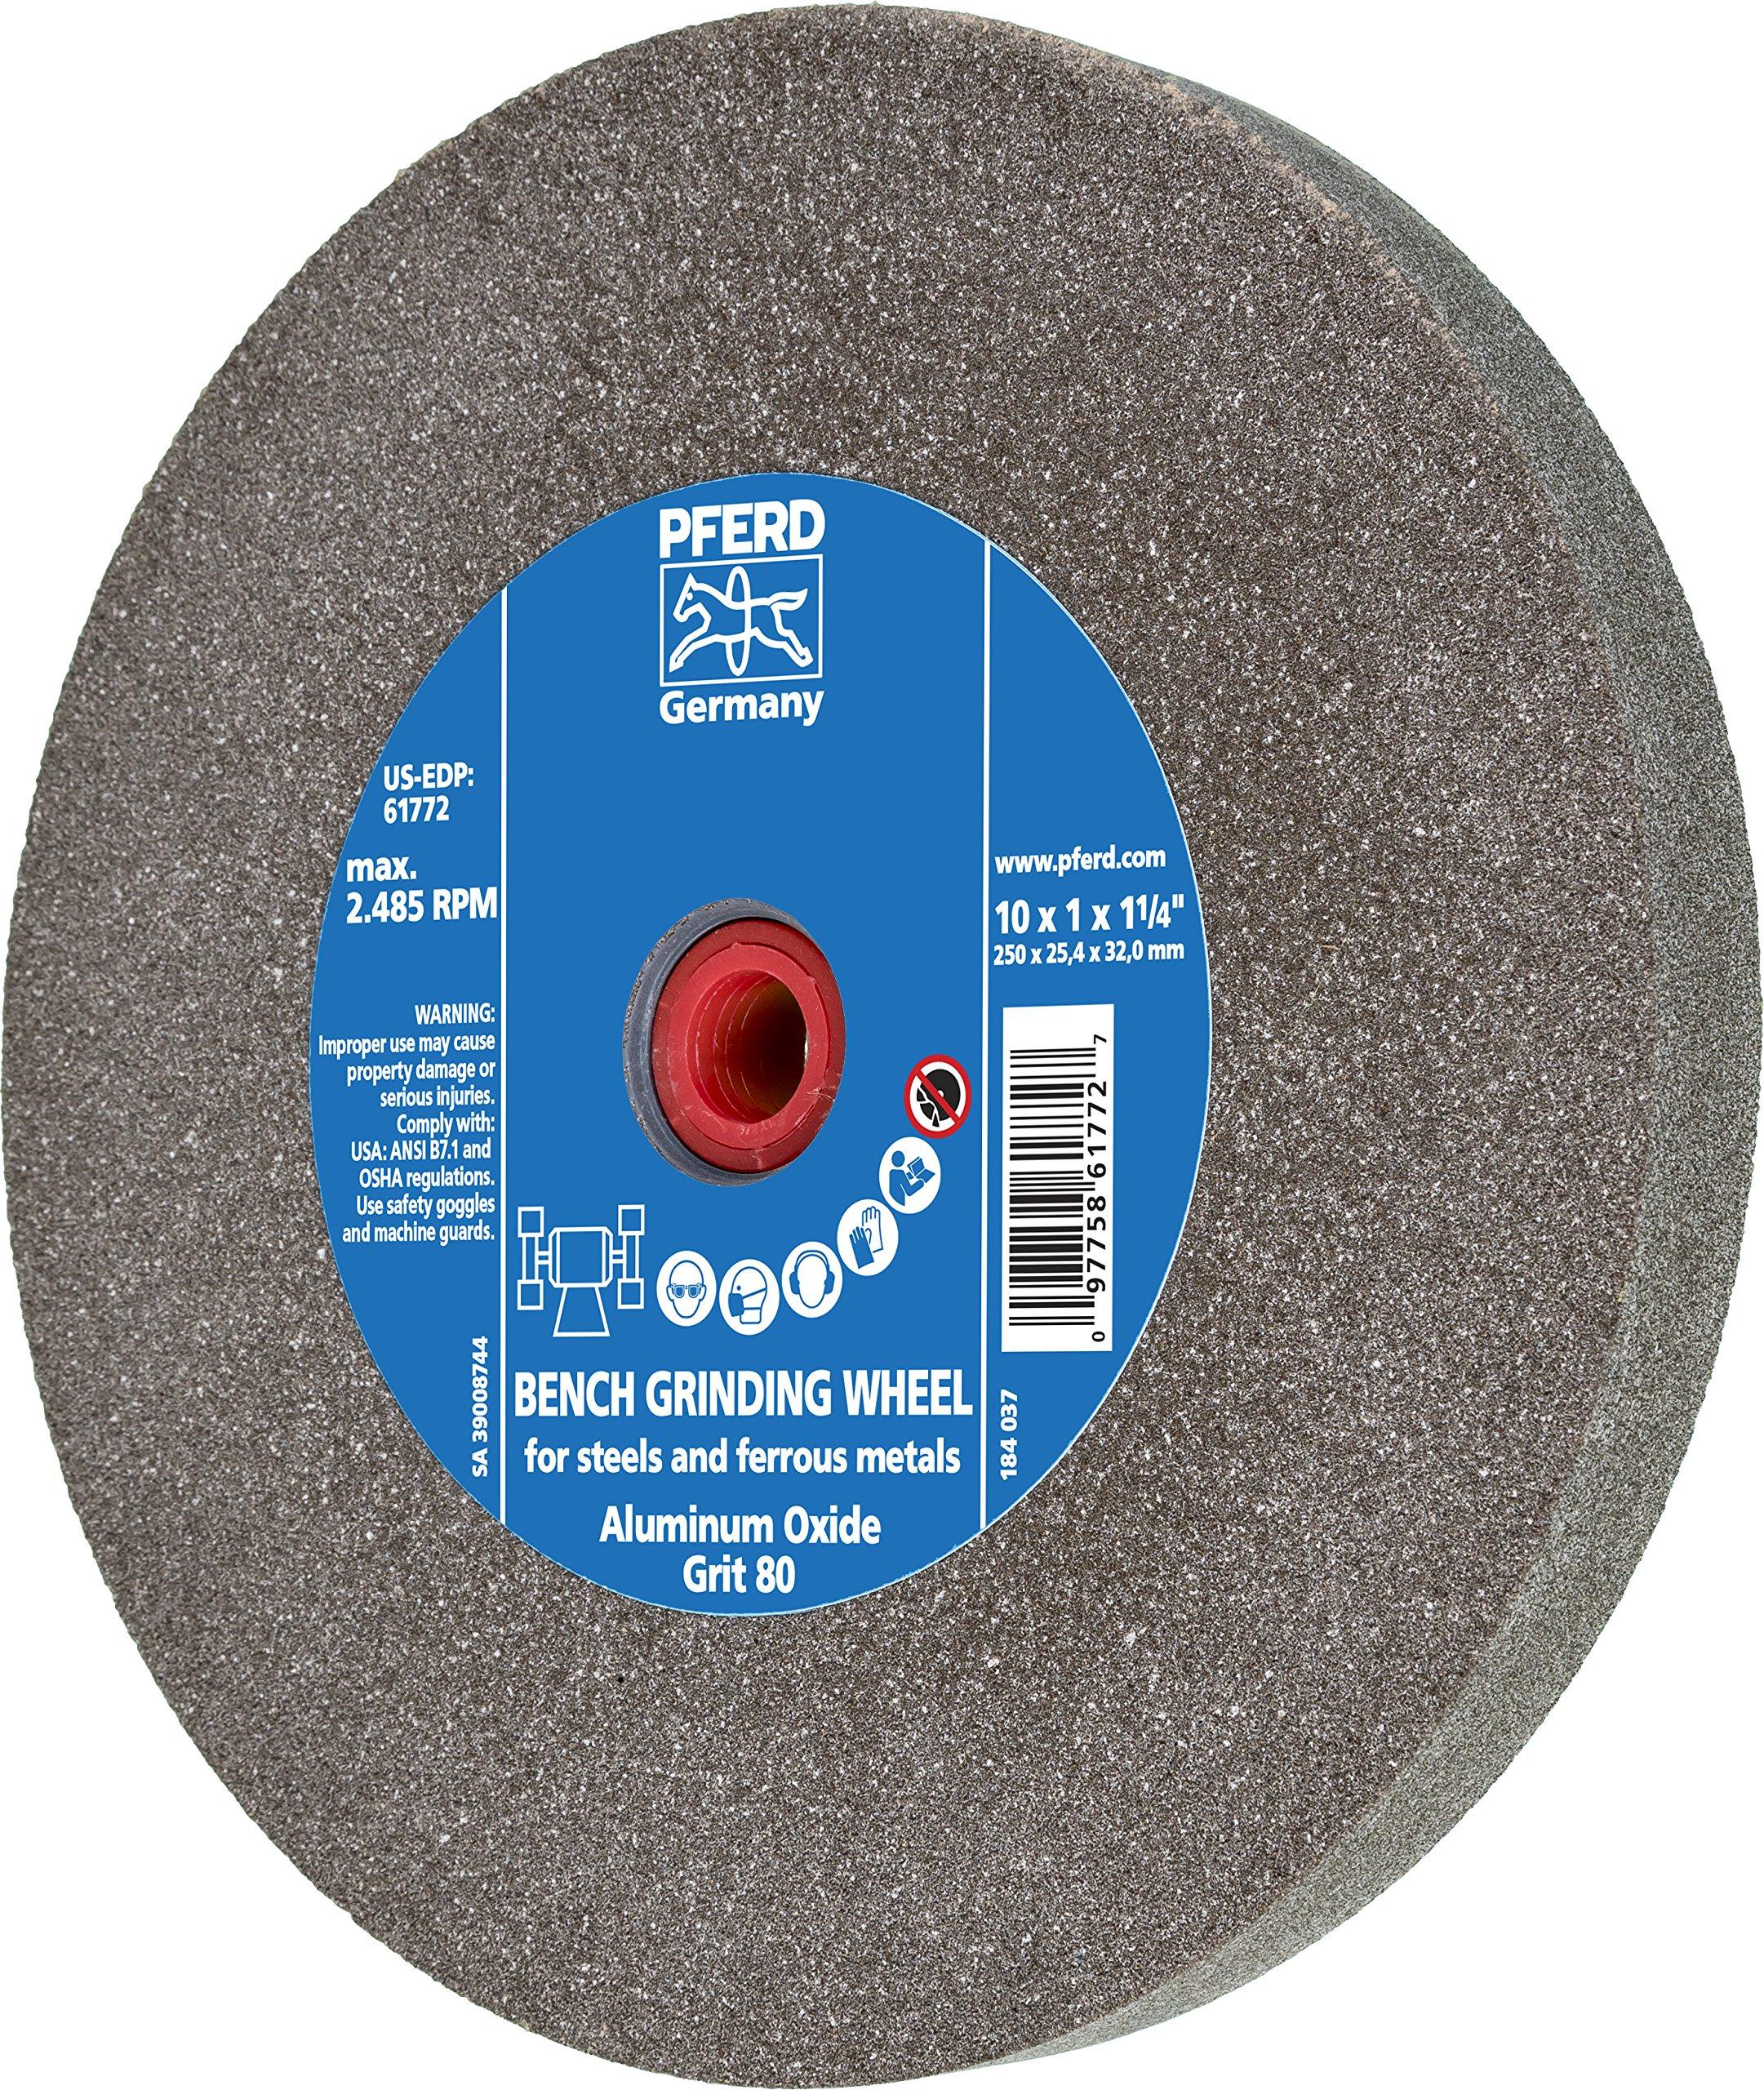 PFERD 61772 Bench Grinding Wheel, Aluminum Oxide, 10'' Diameter, 1'' Thick, 1-1/4'' Arbor Hole, 80 Grit, 2485 Maximum RPM by Pferd